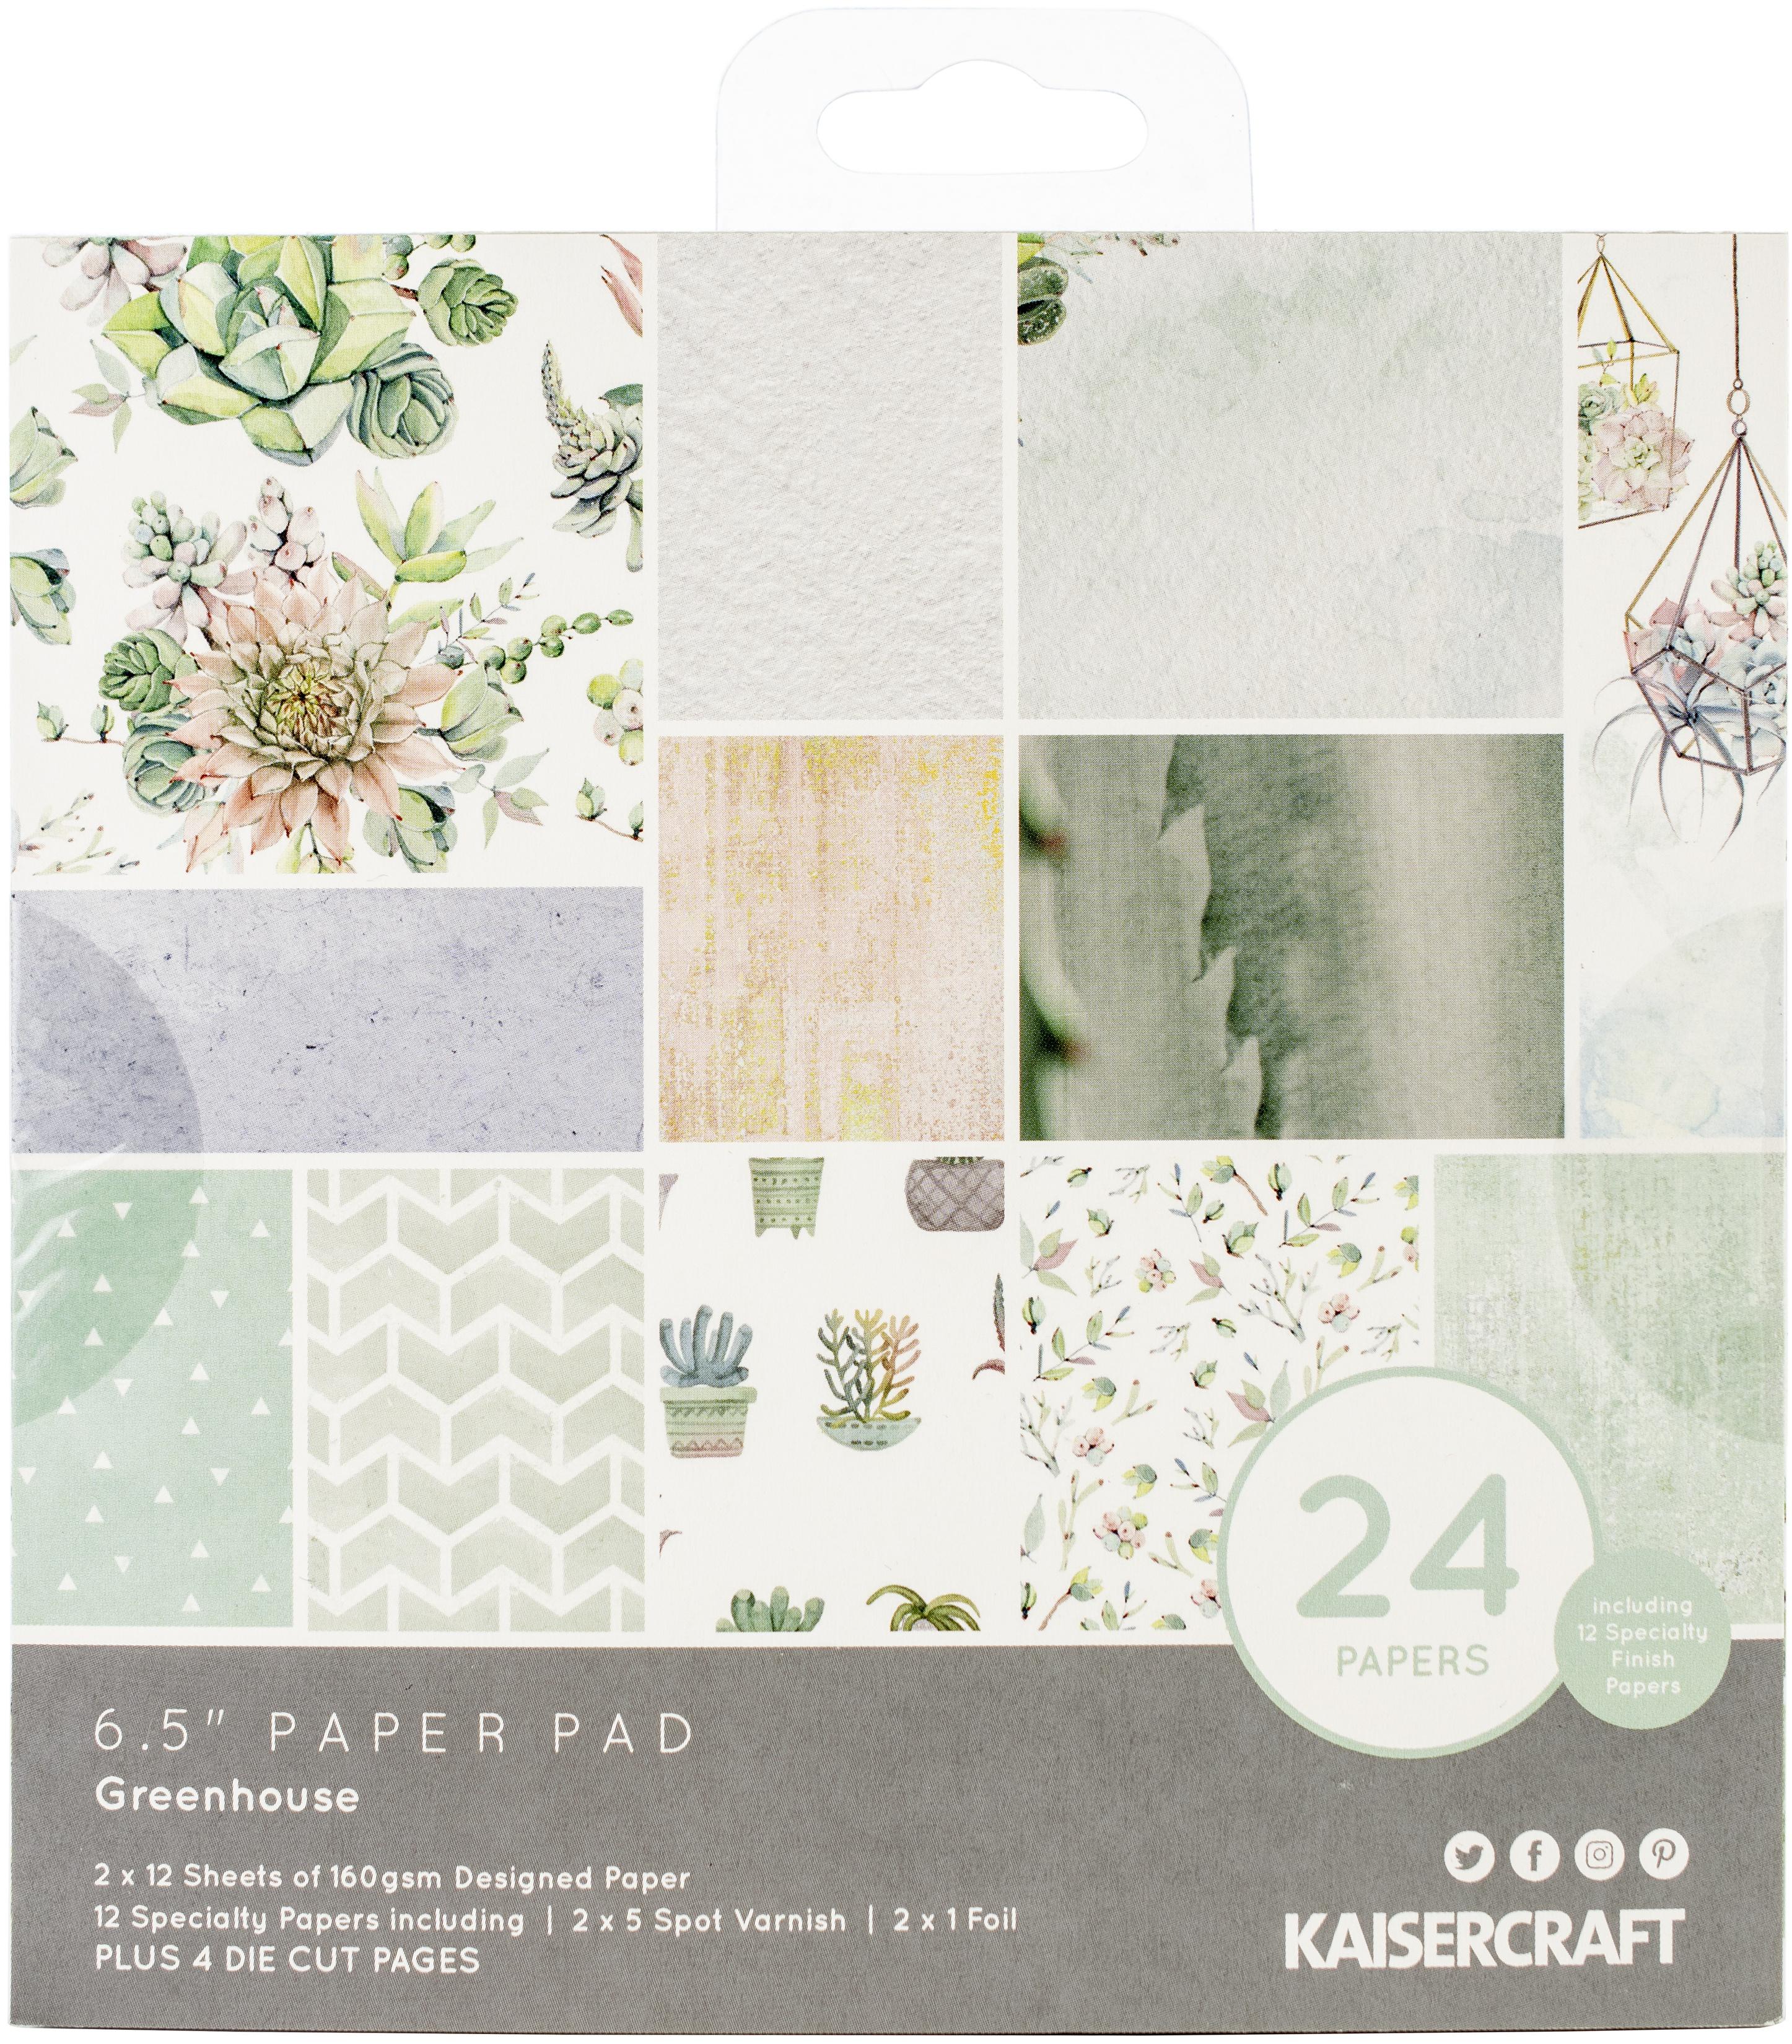 Kaisercraft - Greenhouse - 6.5 Paper Pad